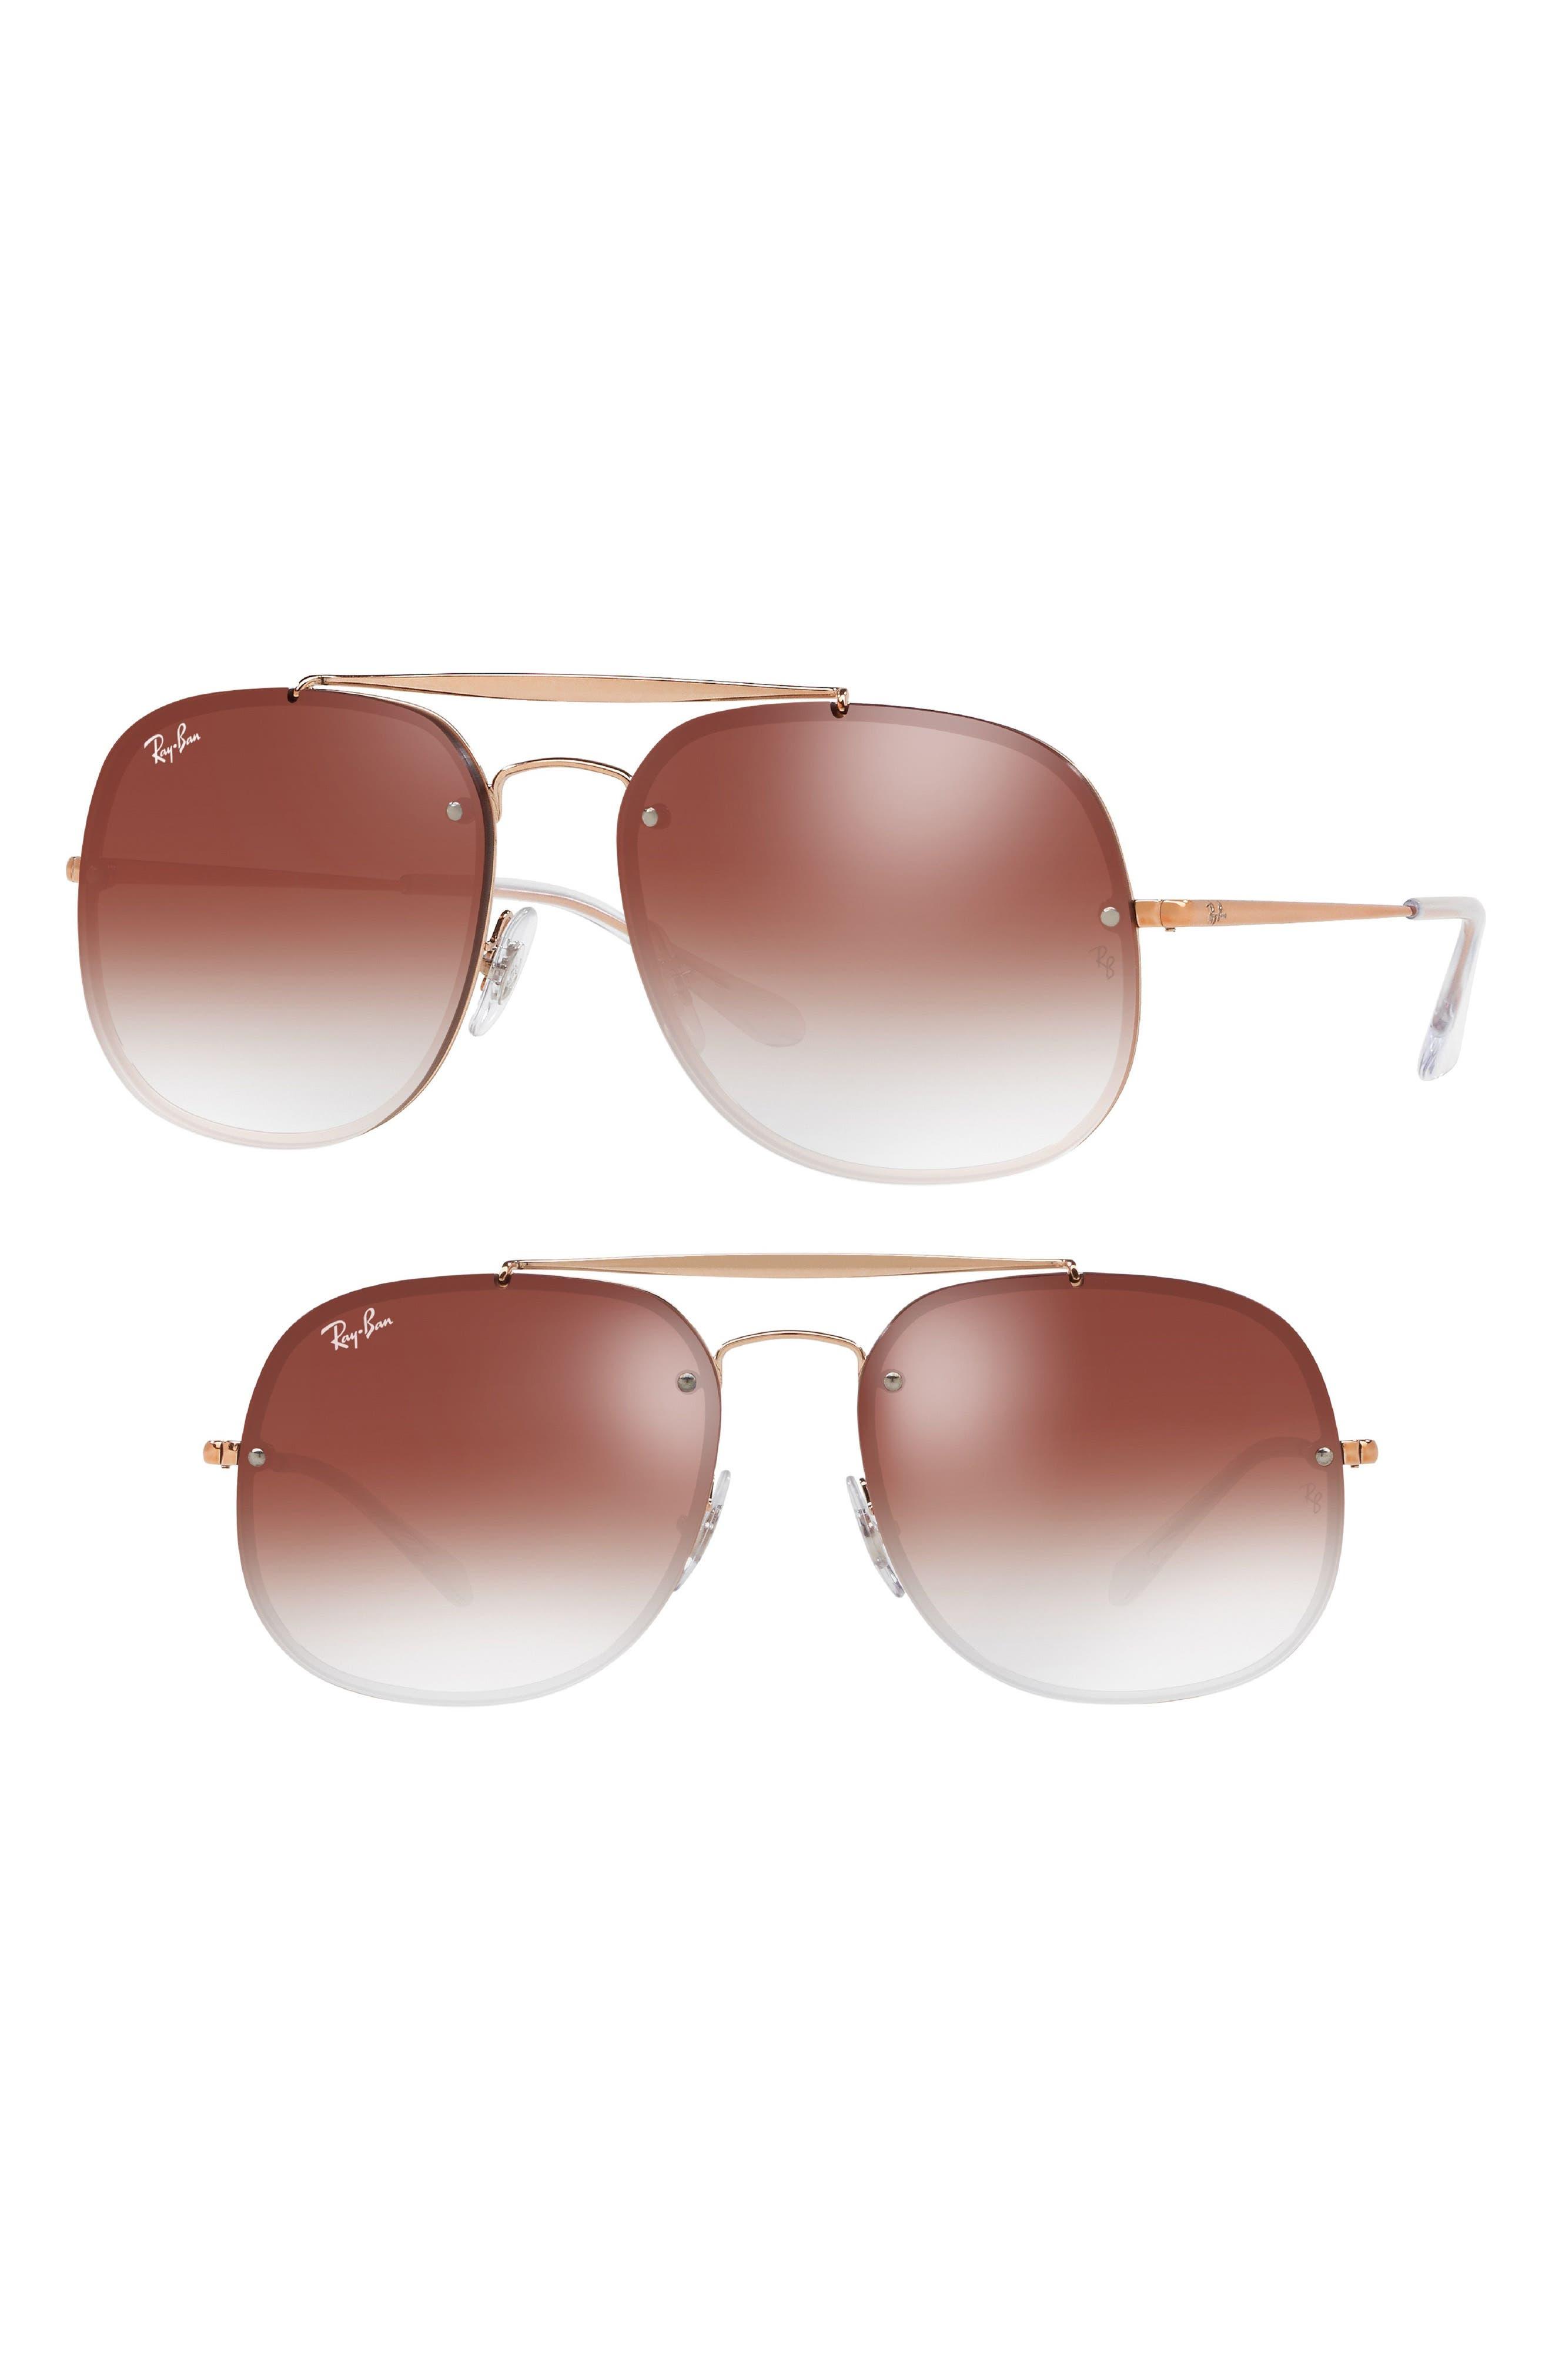 Blaze 58mm Gradient Lens Aviator Sunglasses,                         Main,                         color, COPPER